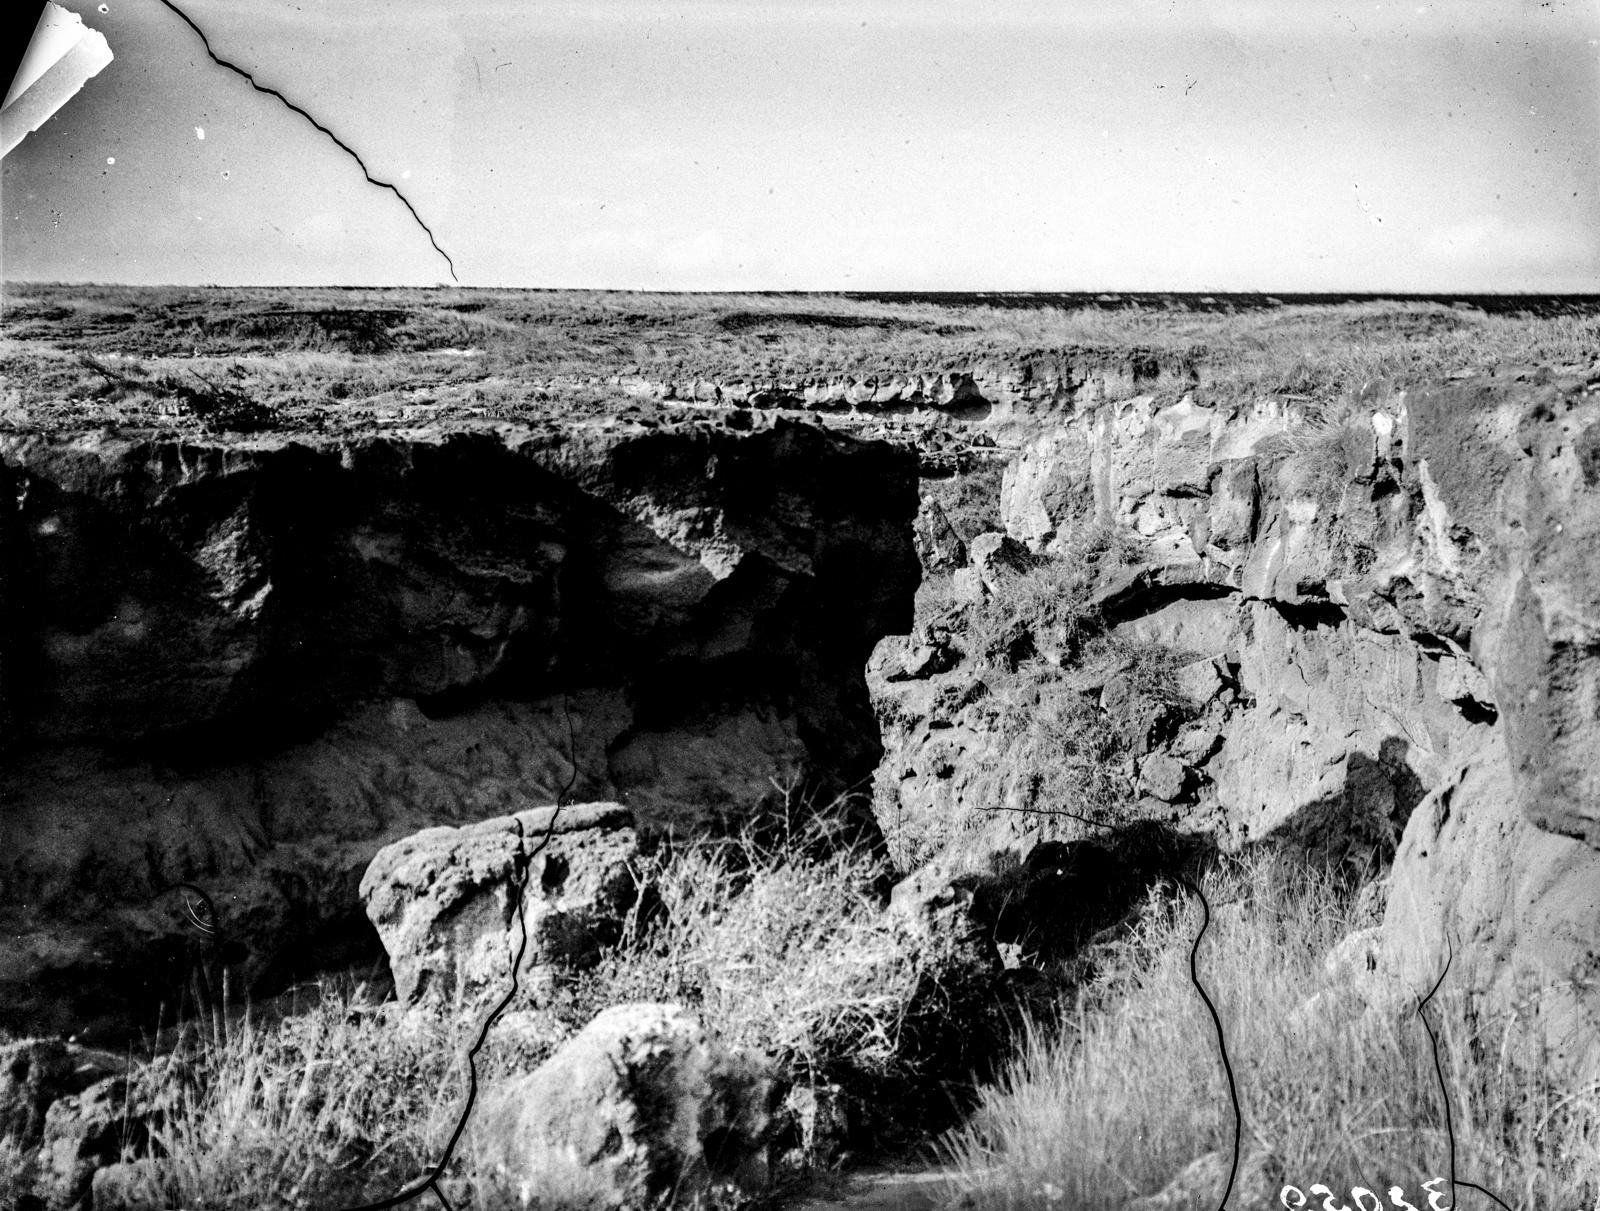 19. Вид на ущелье, вероятно, на реке Эмугур Оретати